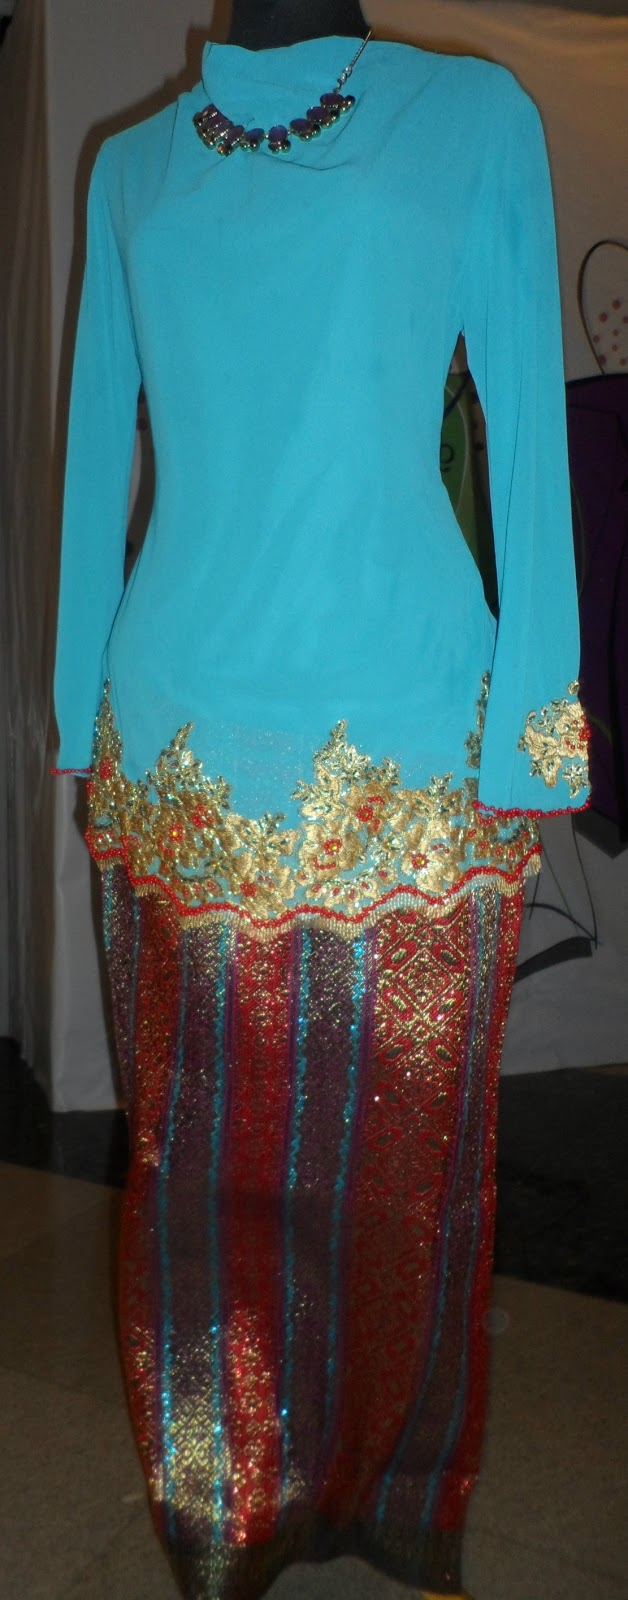 "Koleksi terkini ""Baju Kurung Kedah Songket"". Gabungan tradisional dan"